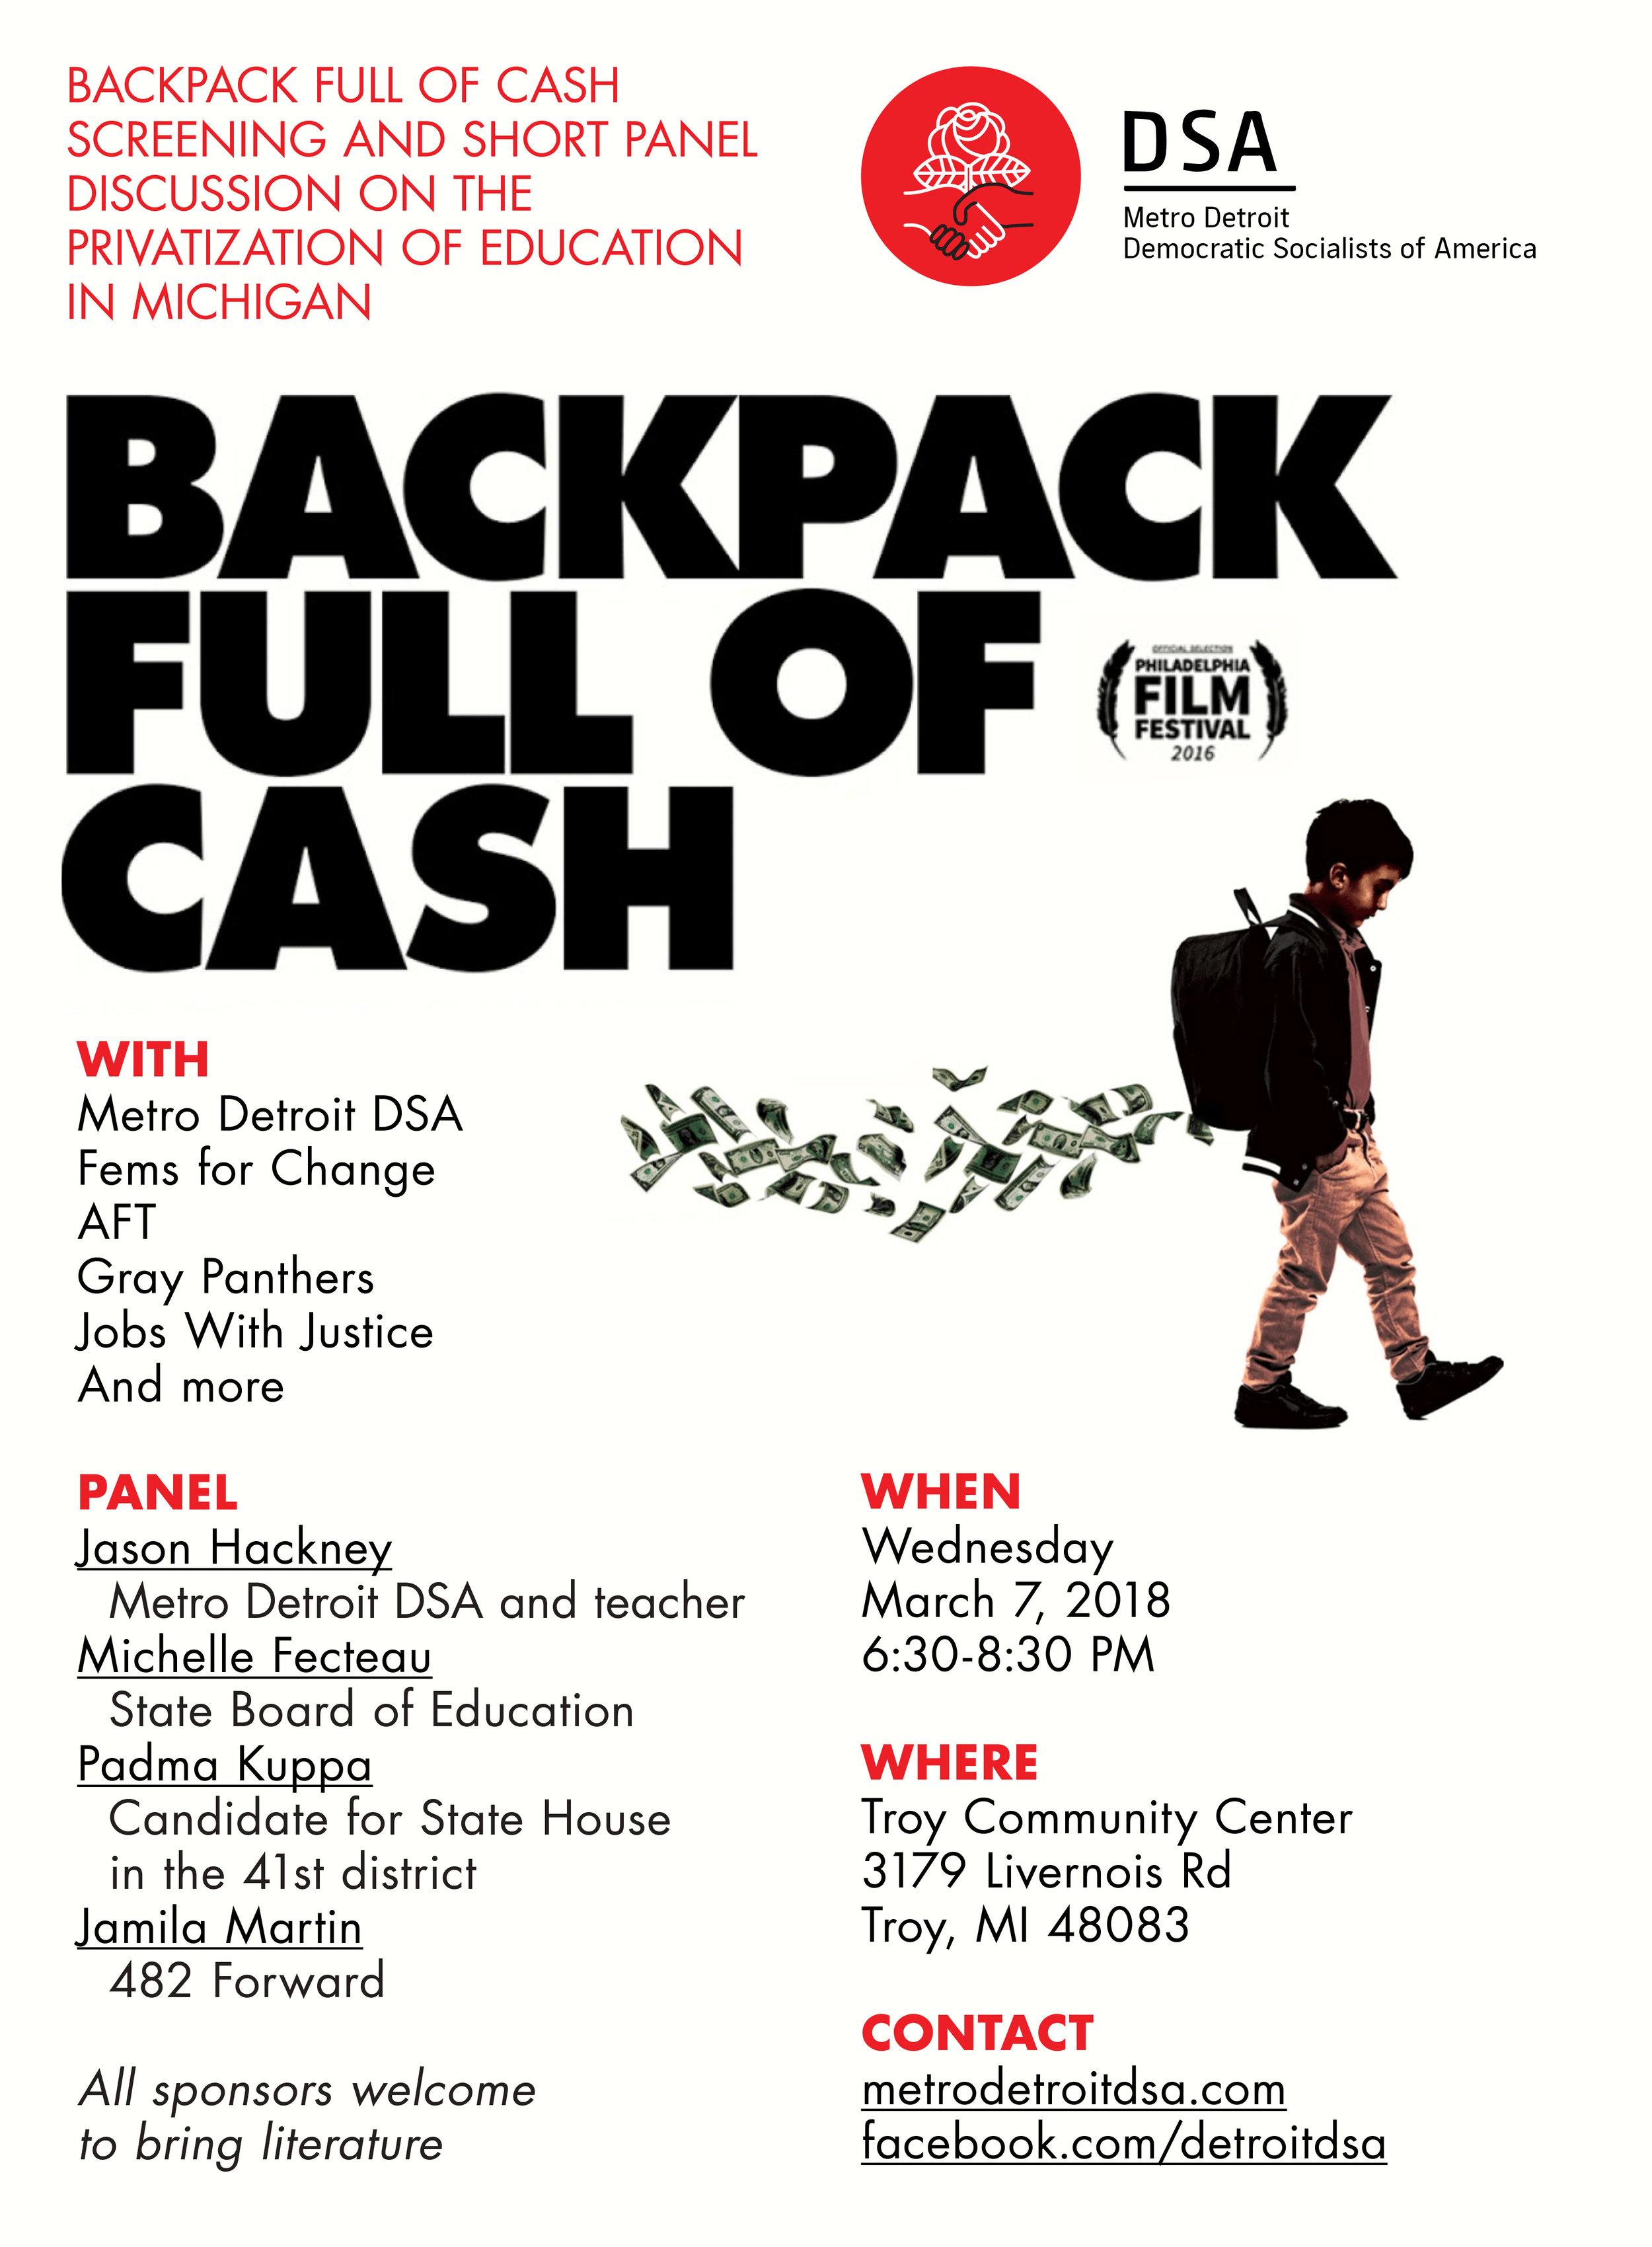 DDSA-BackpackFullofCashFlyer.jpg